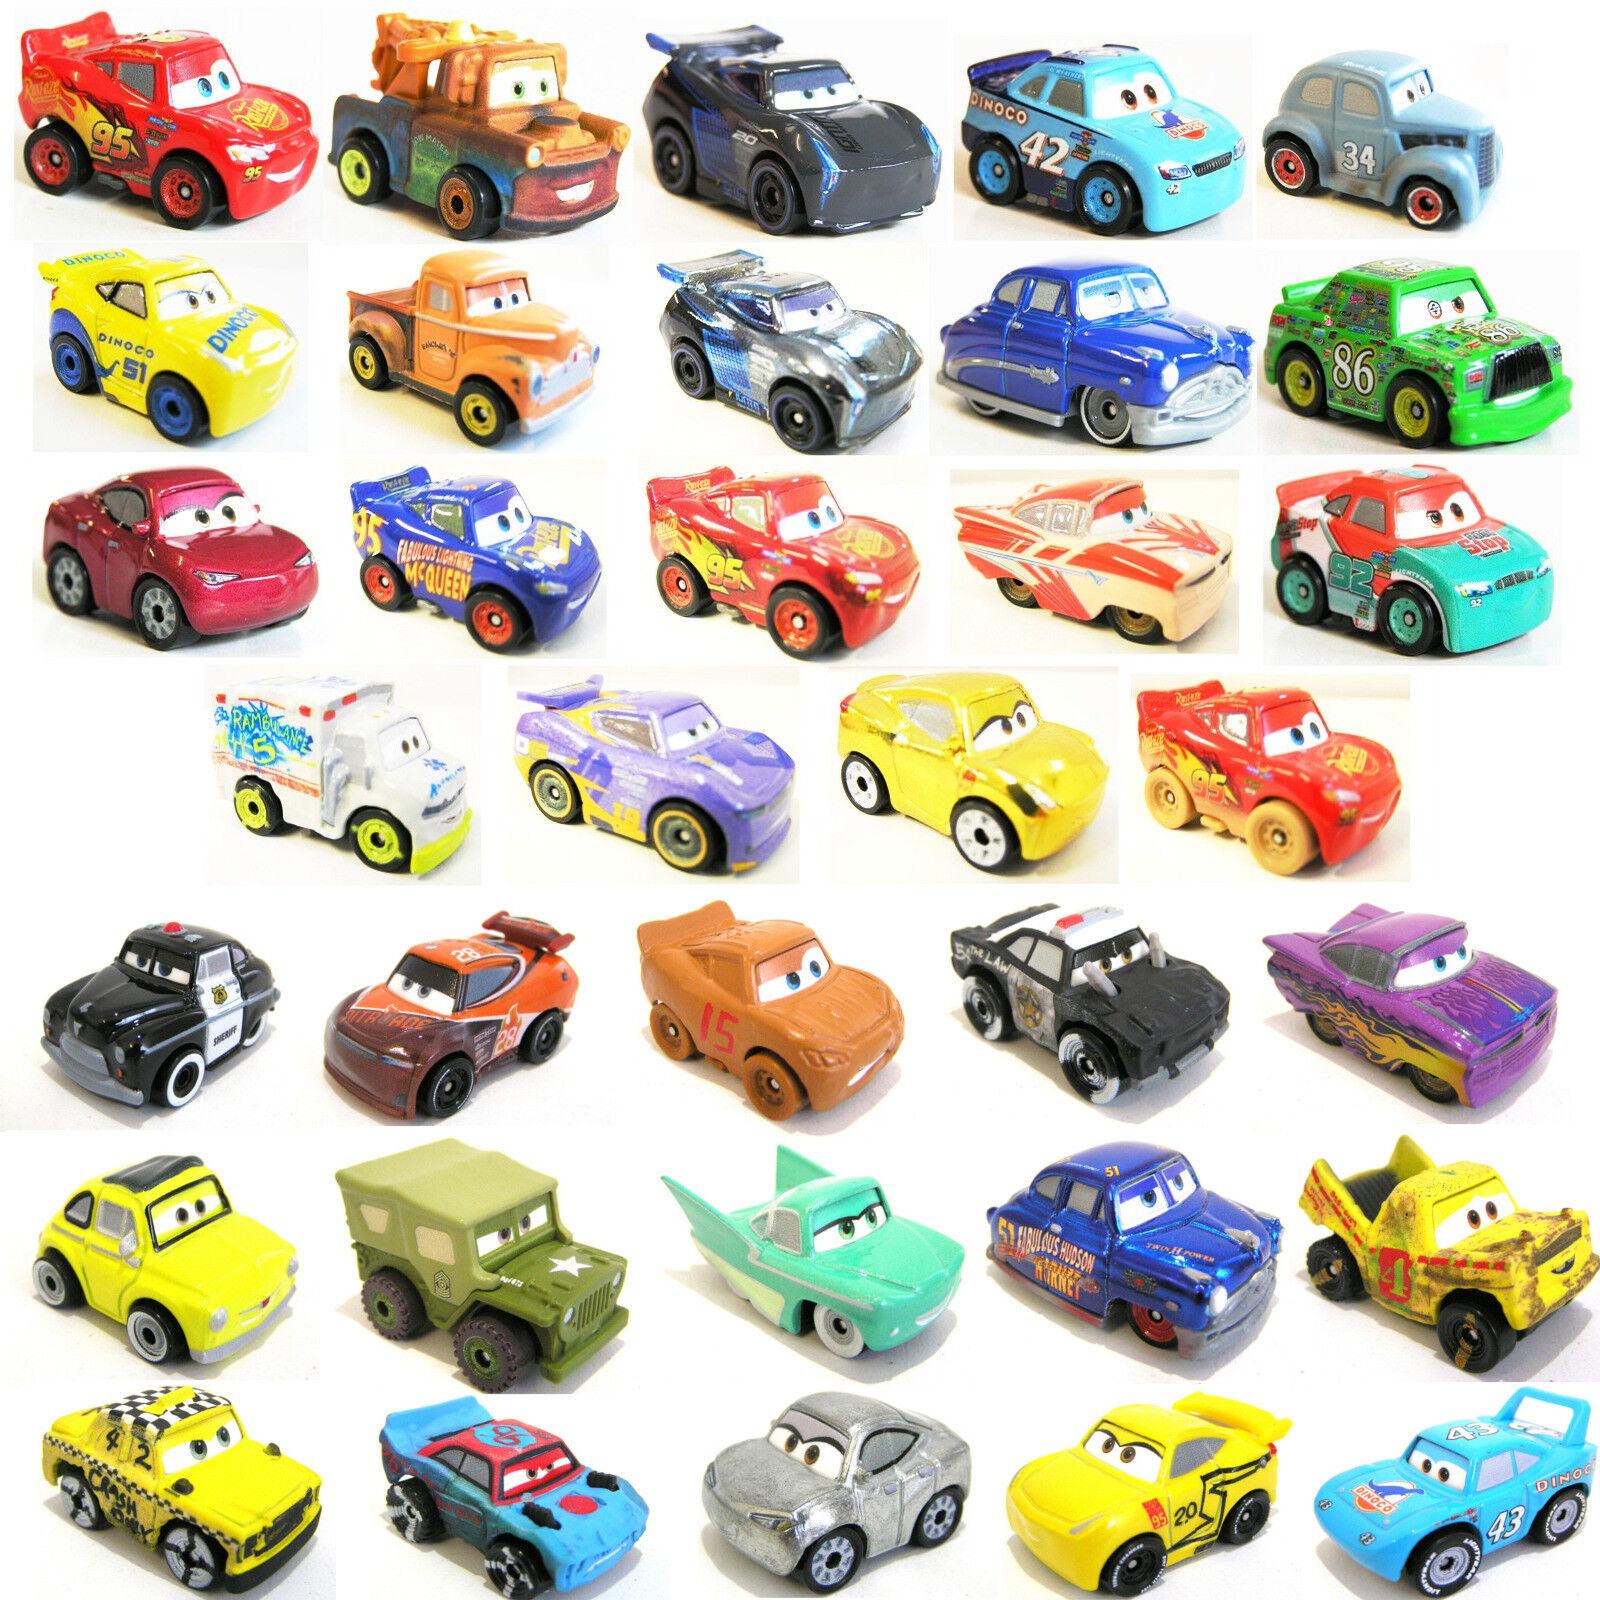 Disney - Cars 3 - Mini / Micro Racers - Mattel - Alle 103 Racer